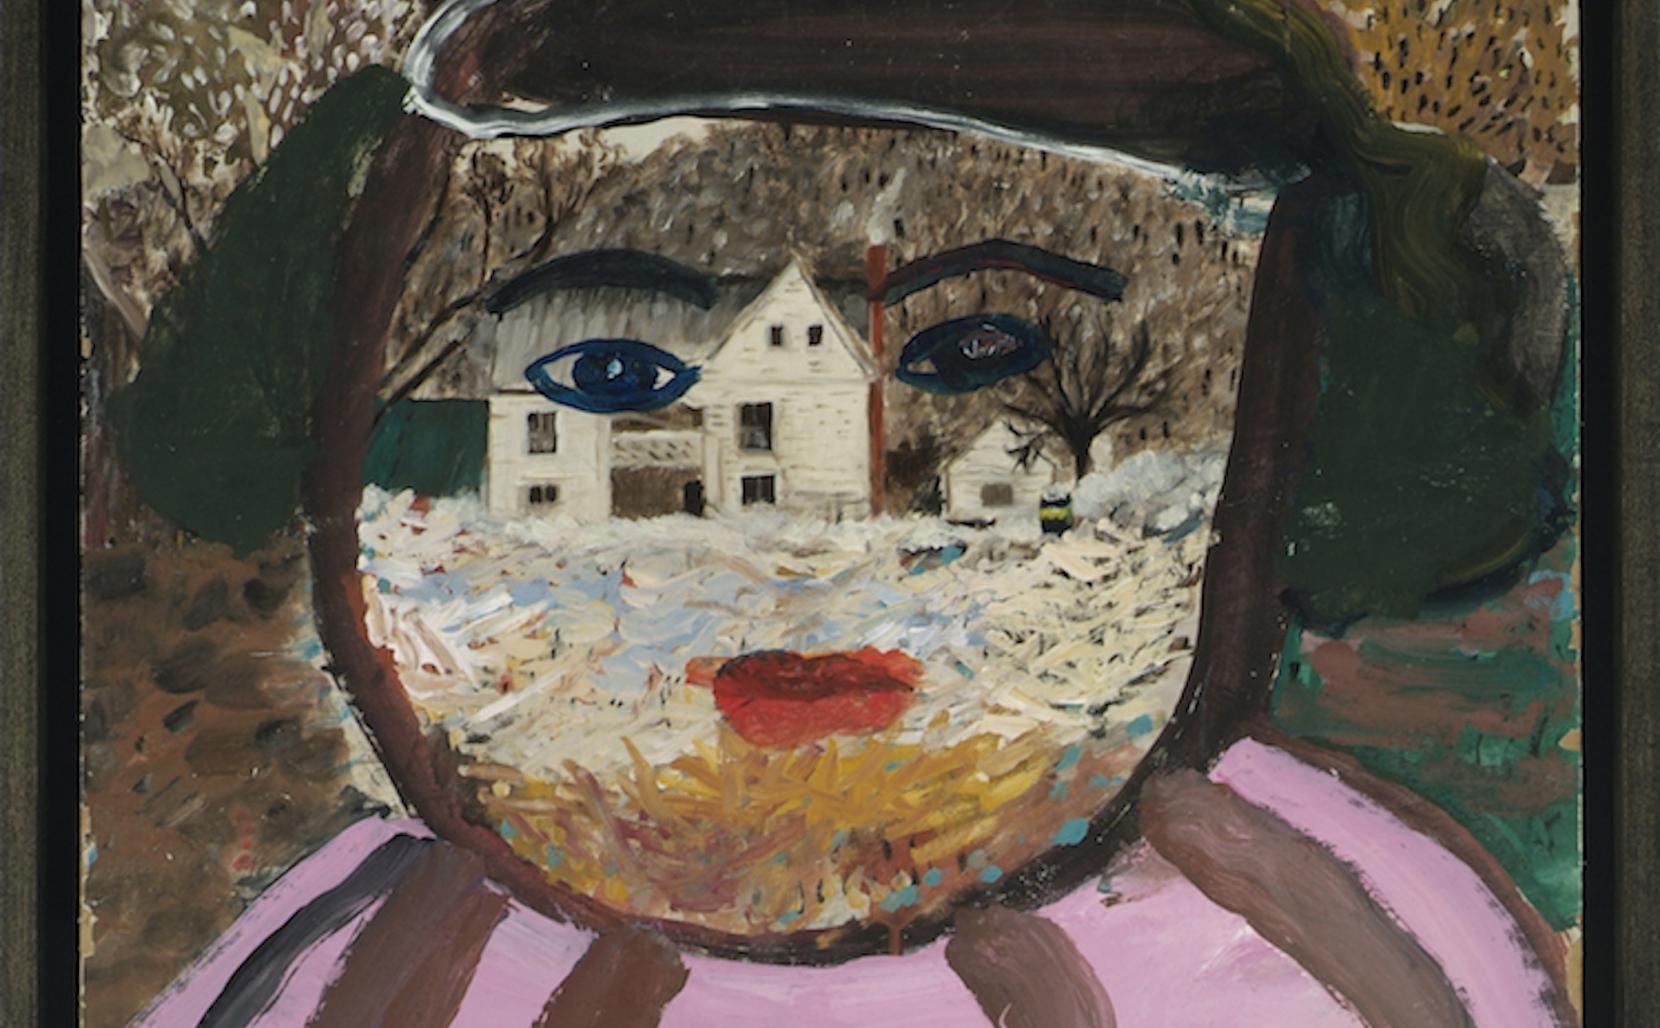 When the Night Speaks: On the Portraits of Margot Bergman